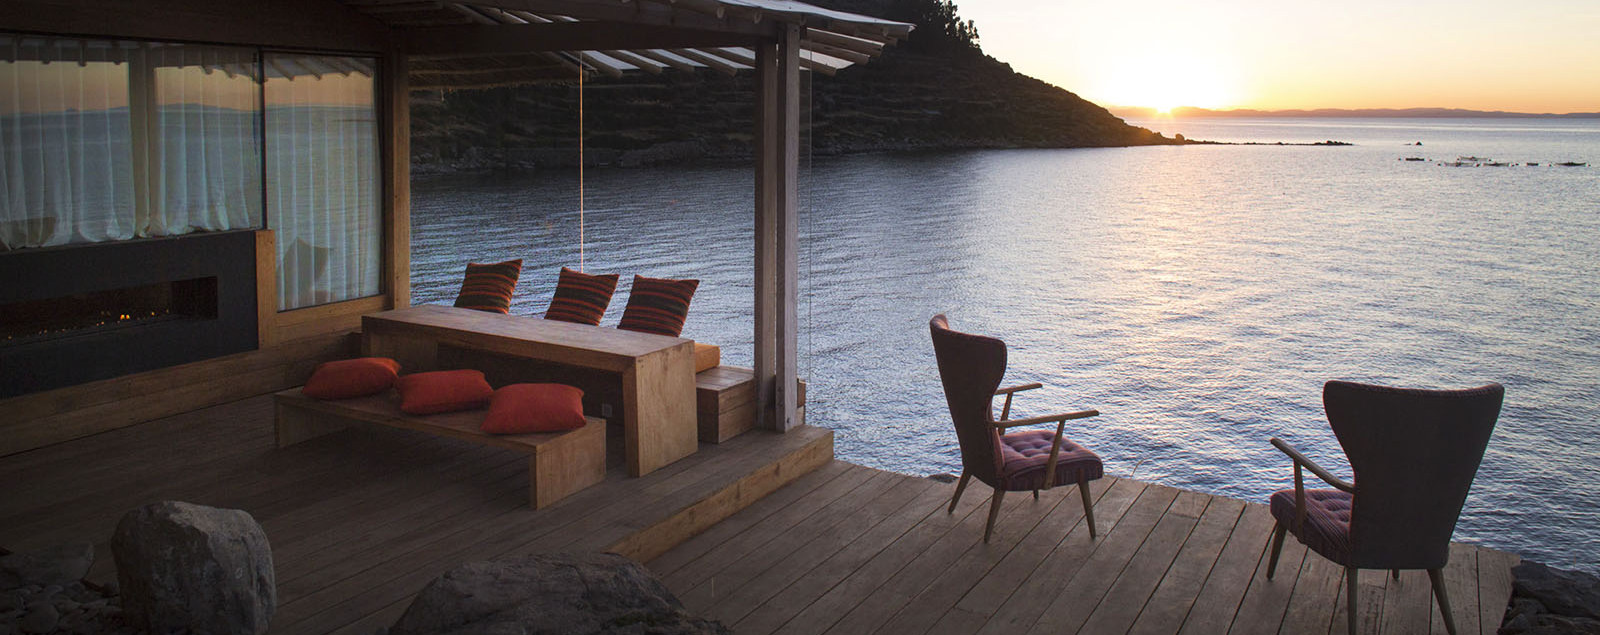 amantika-lodge-twlight-terrace